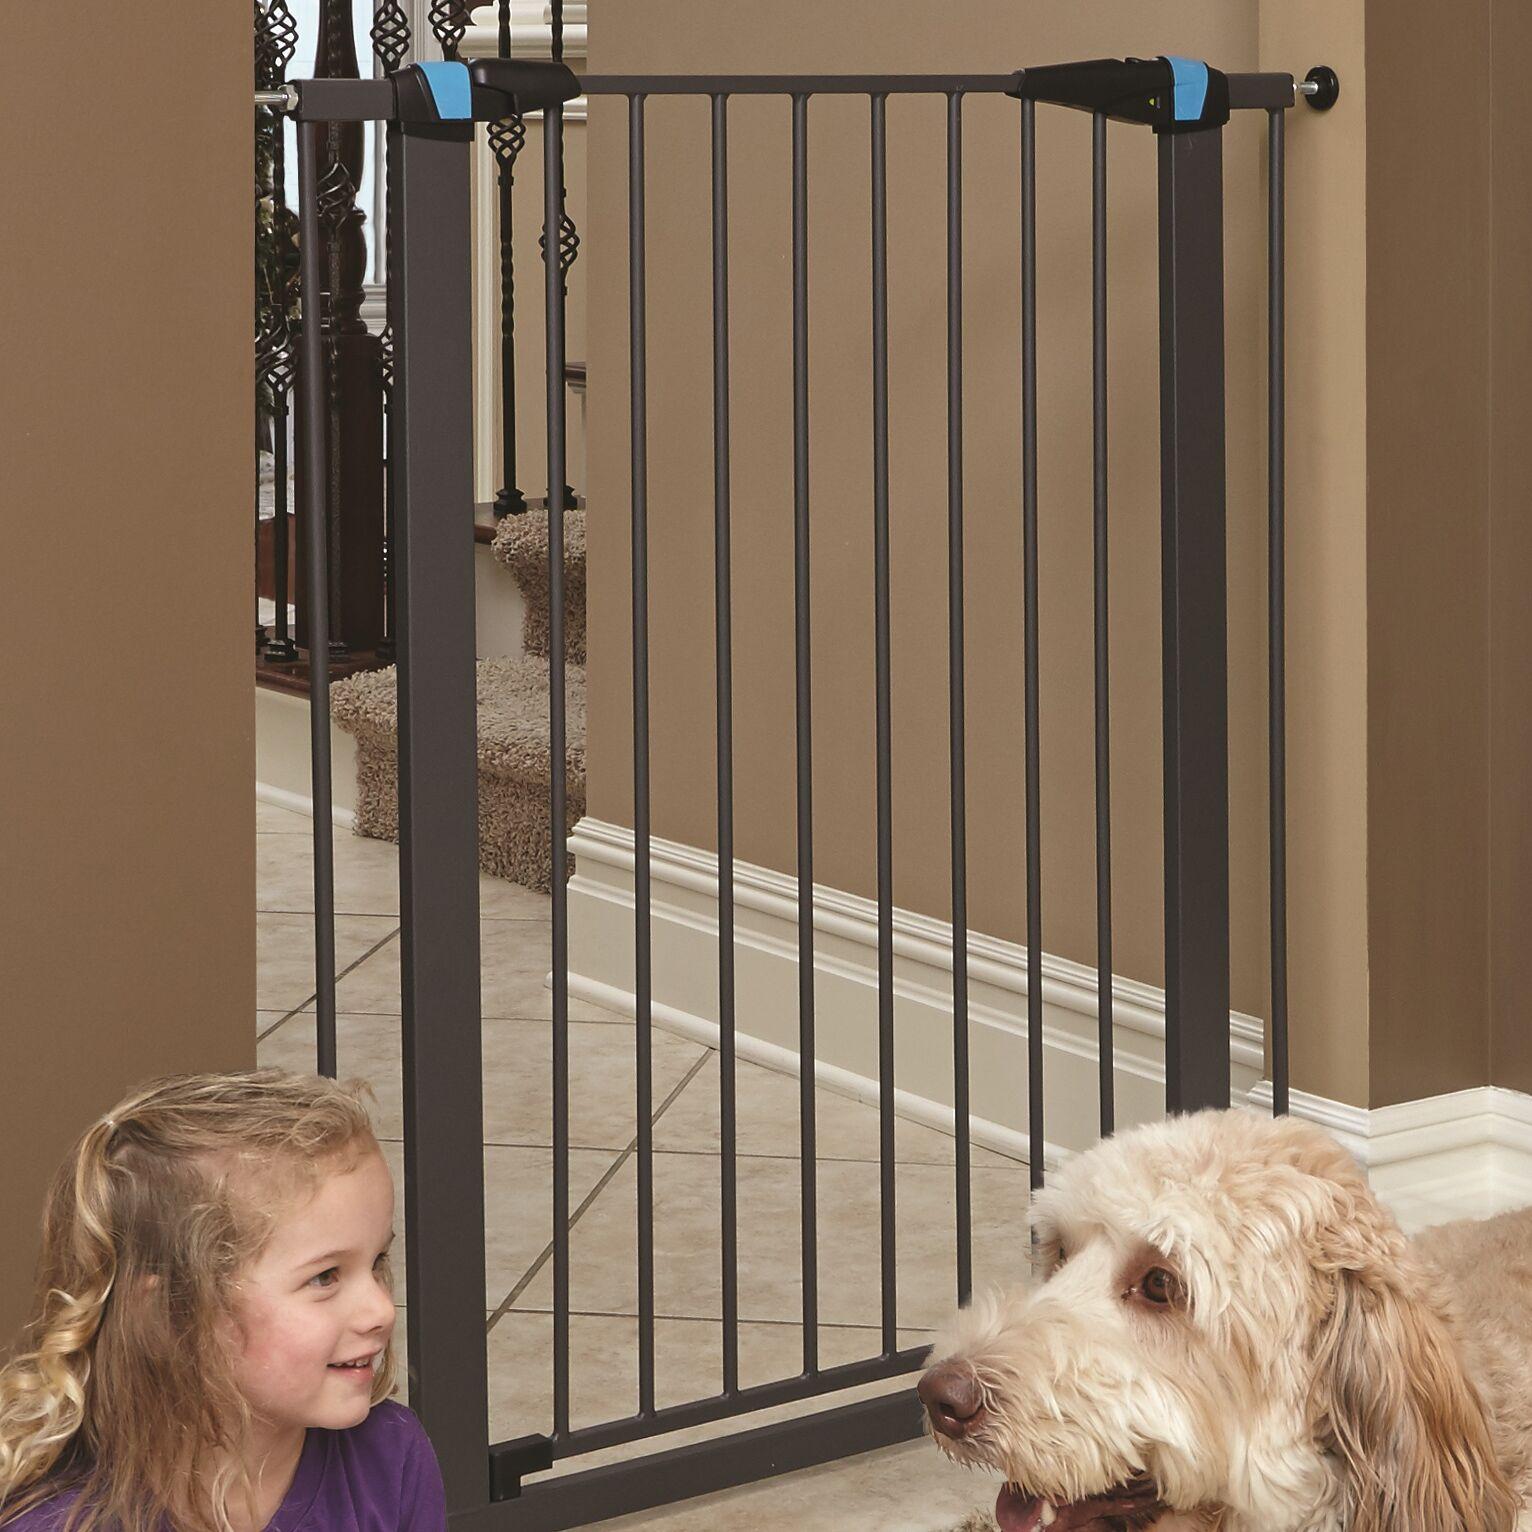 Expands Glow Stripe Pet Gate Size: 39